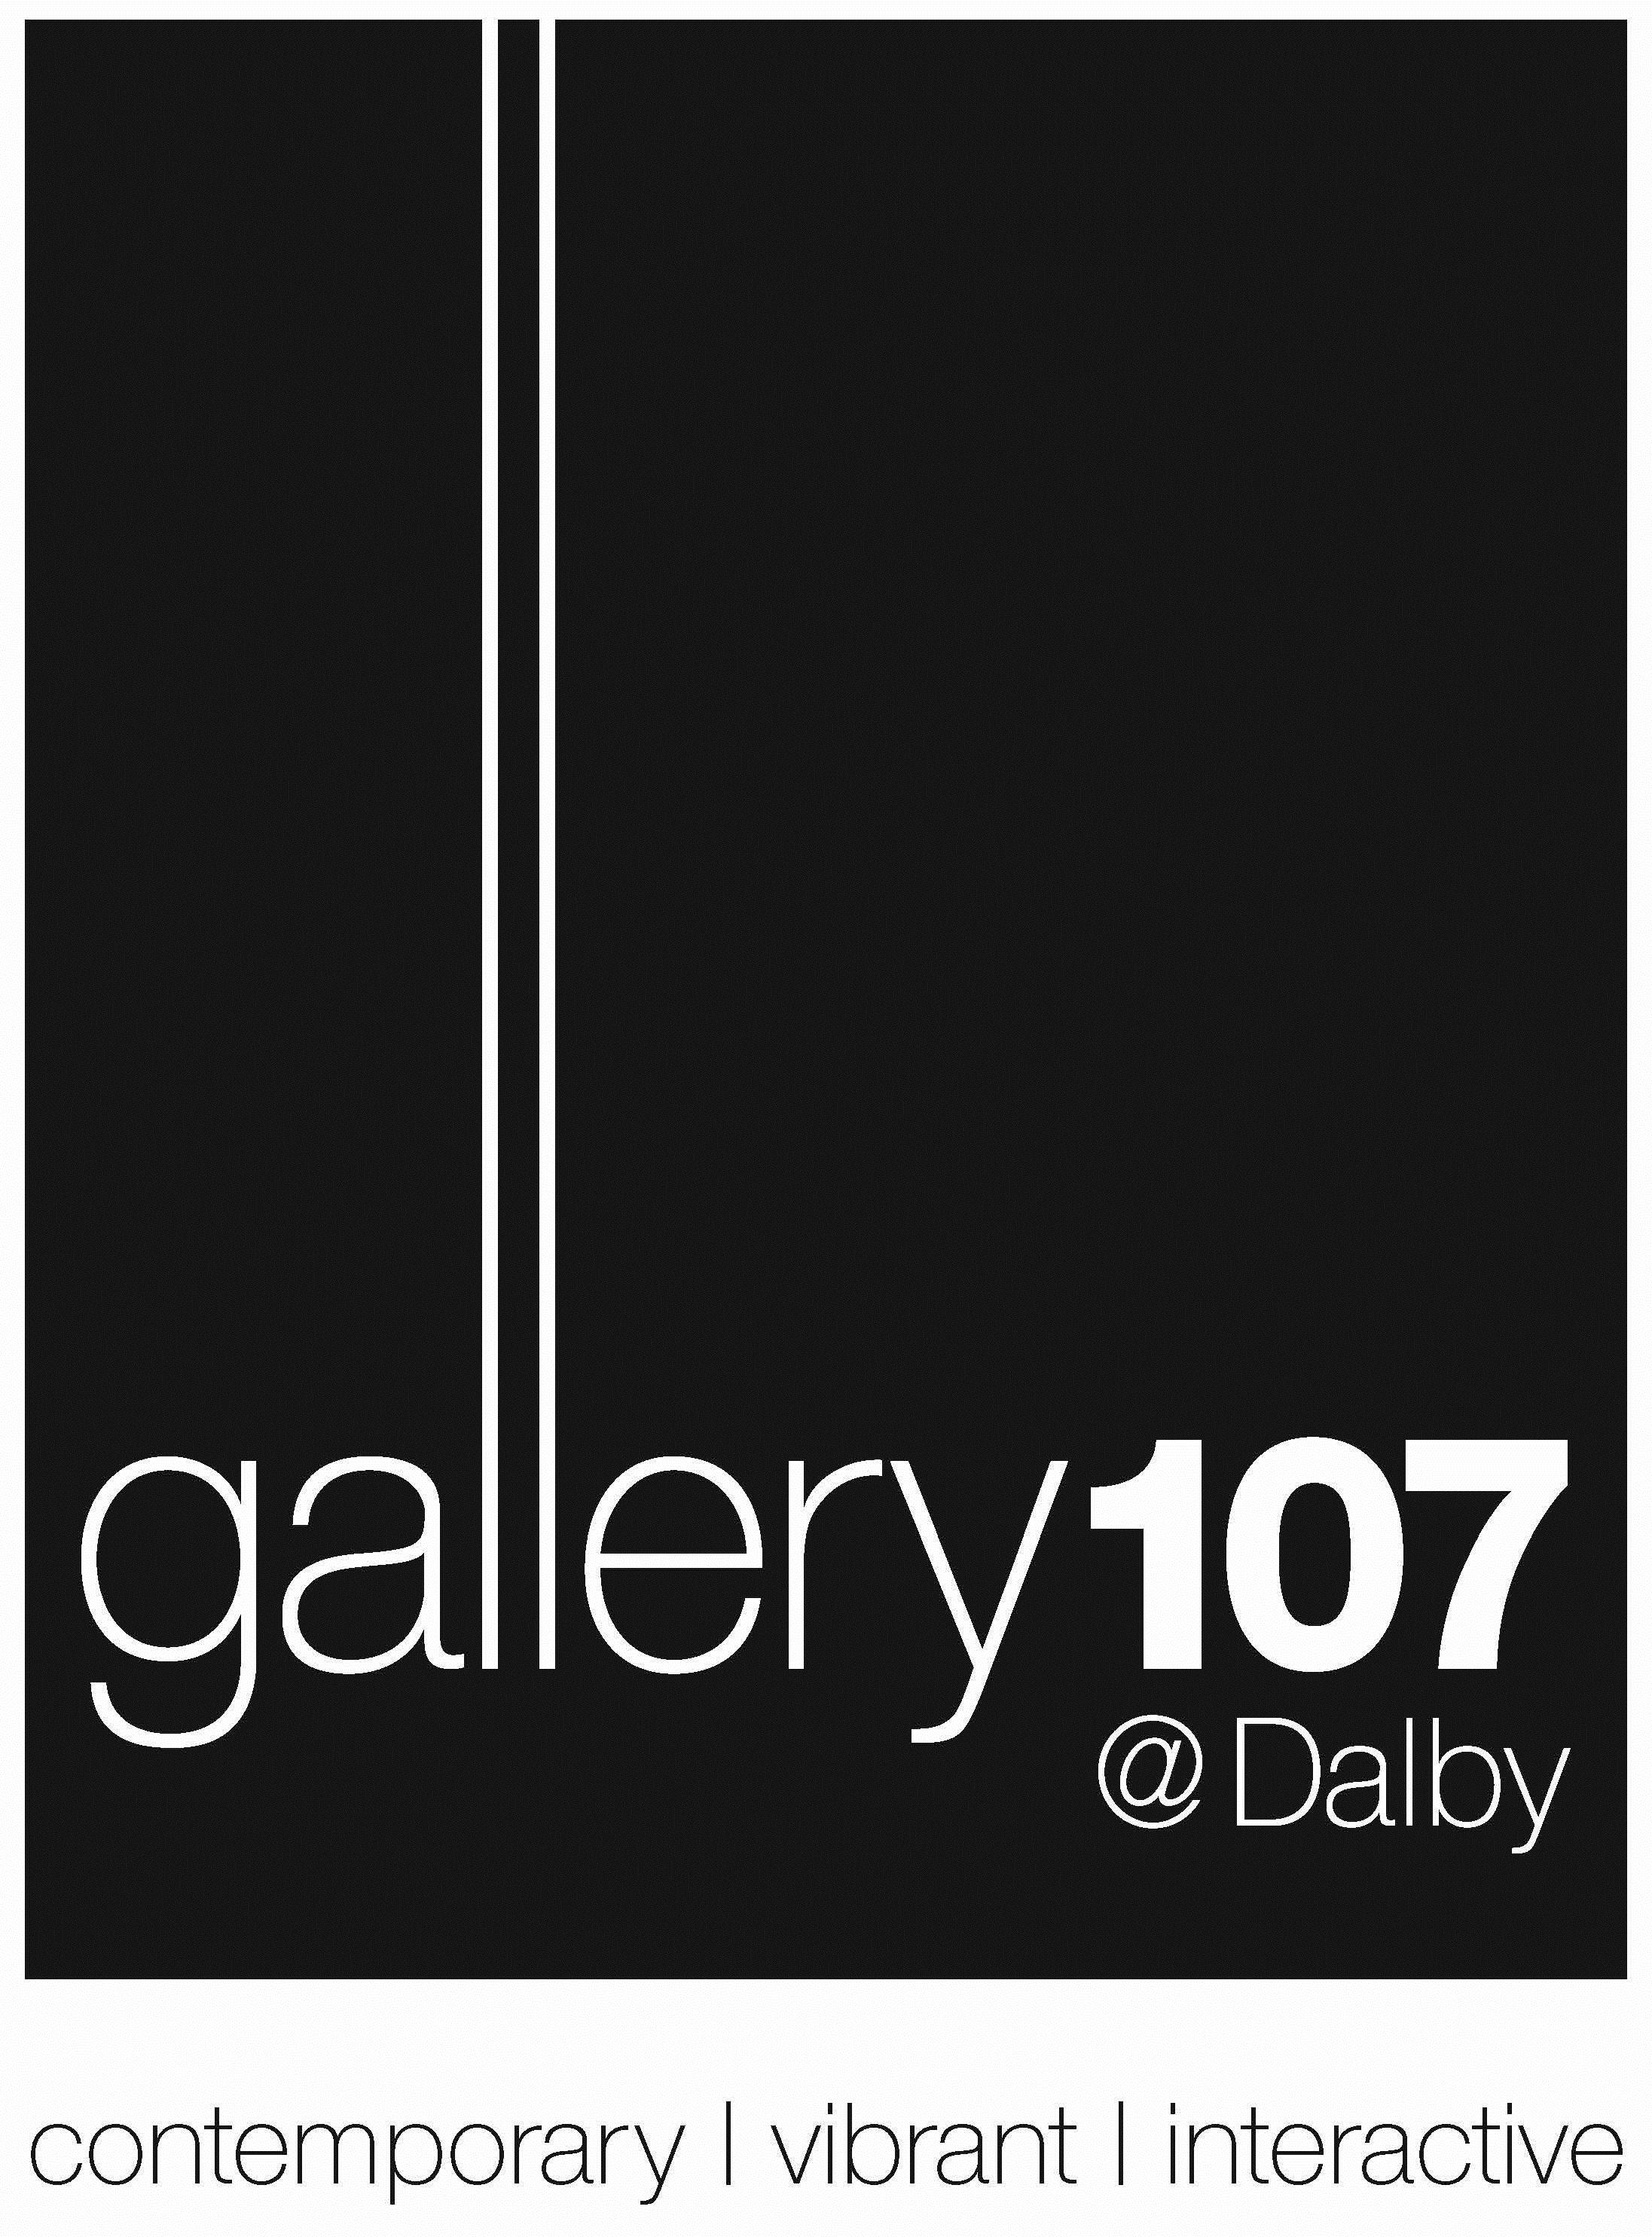 Gallery107Dalby